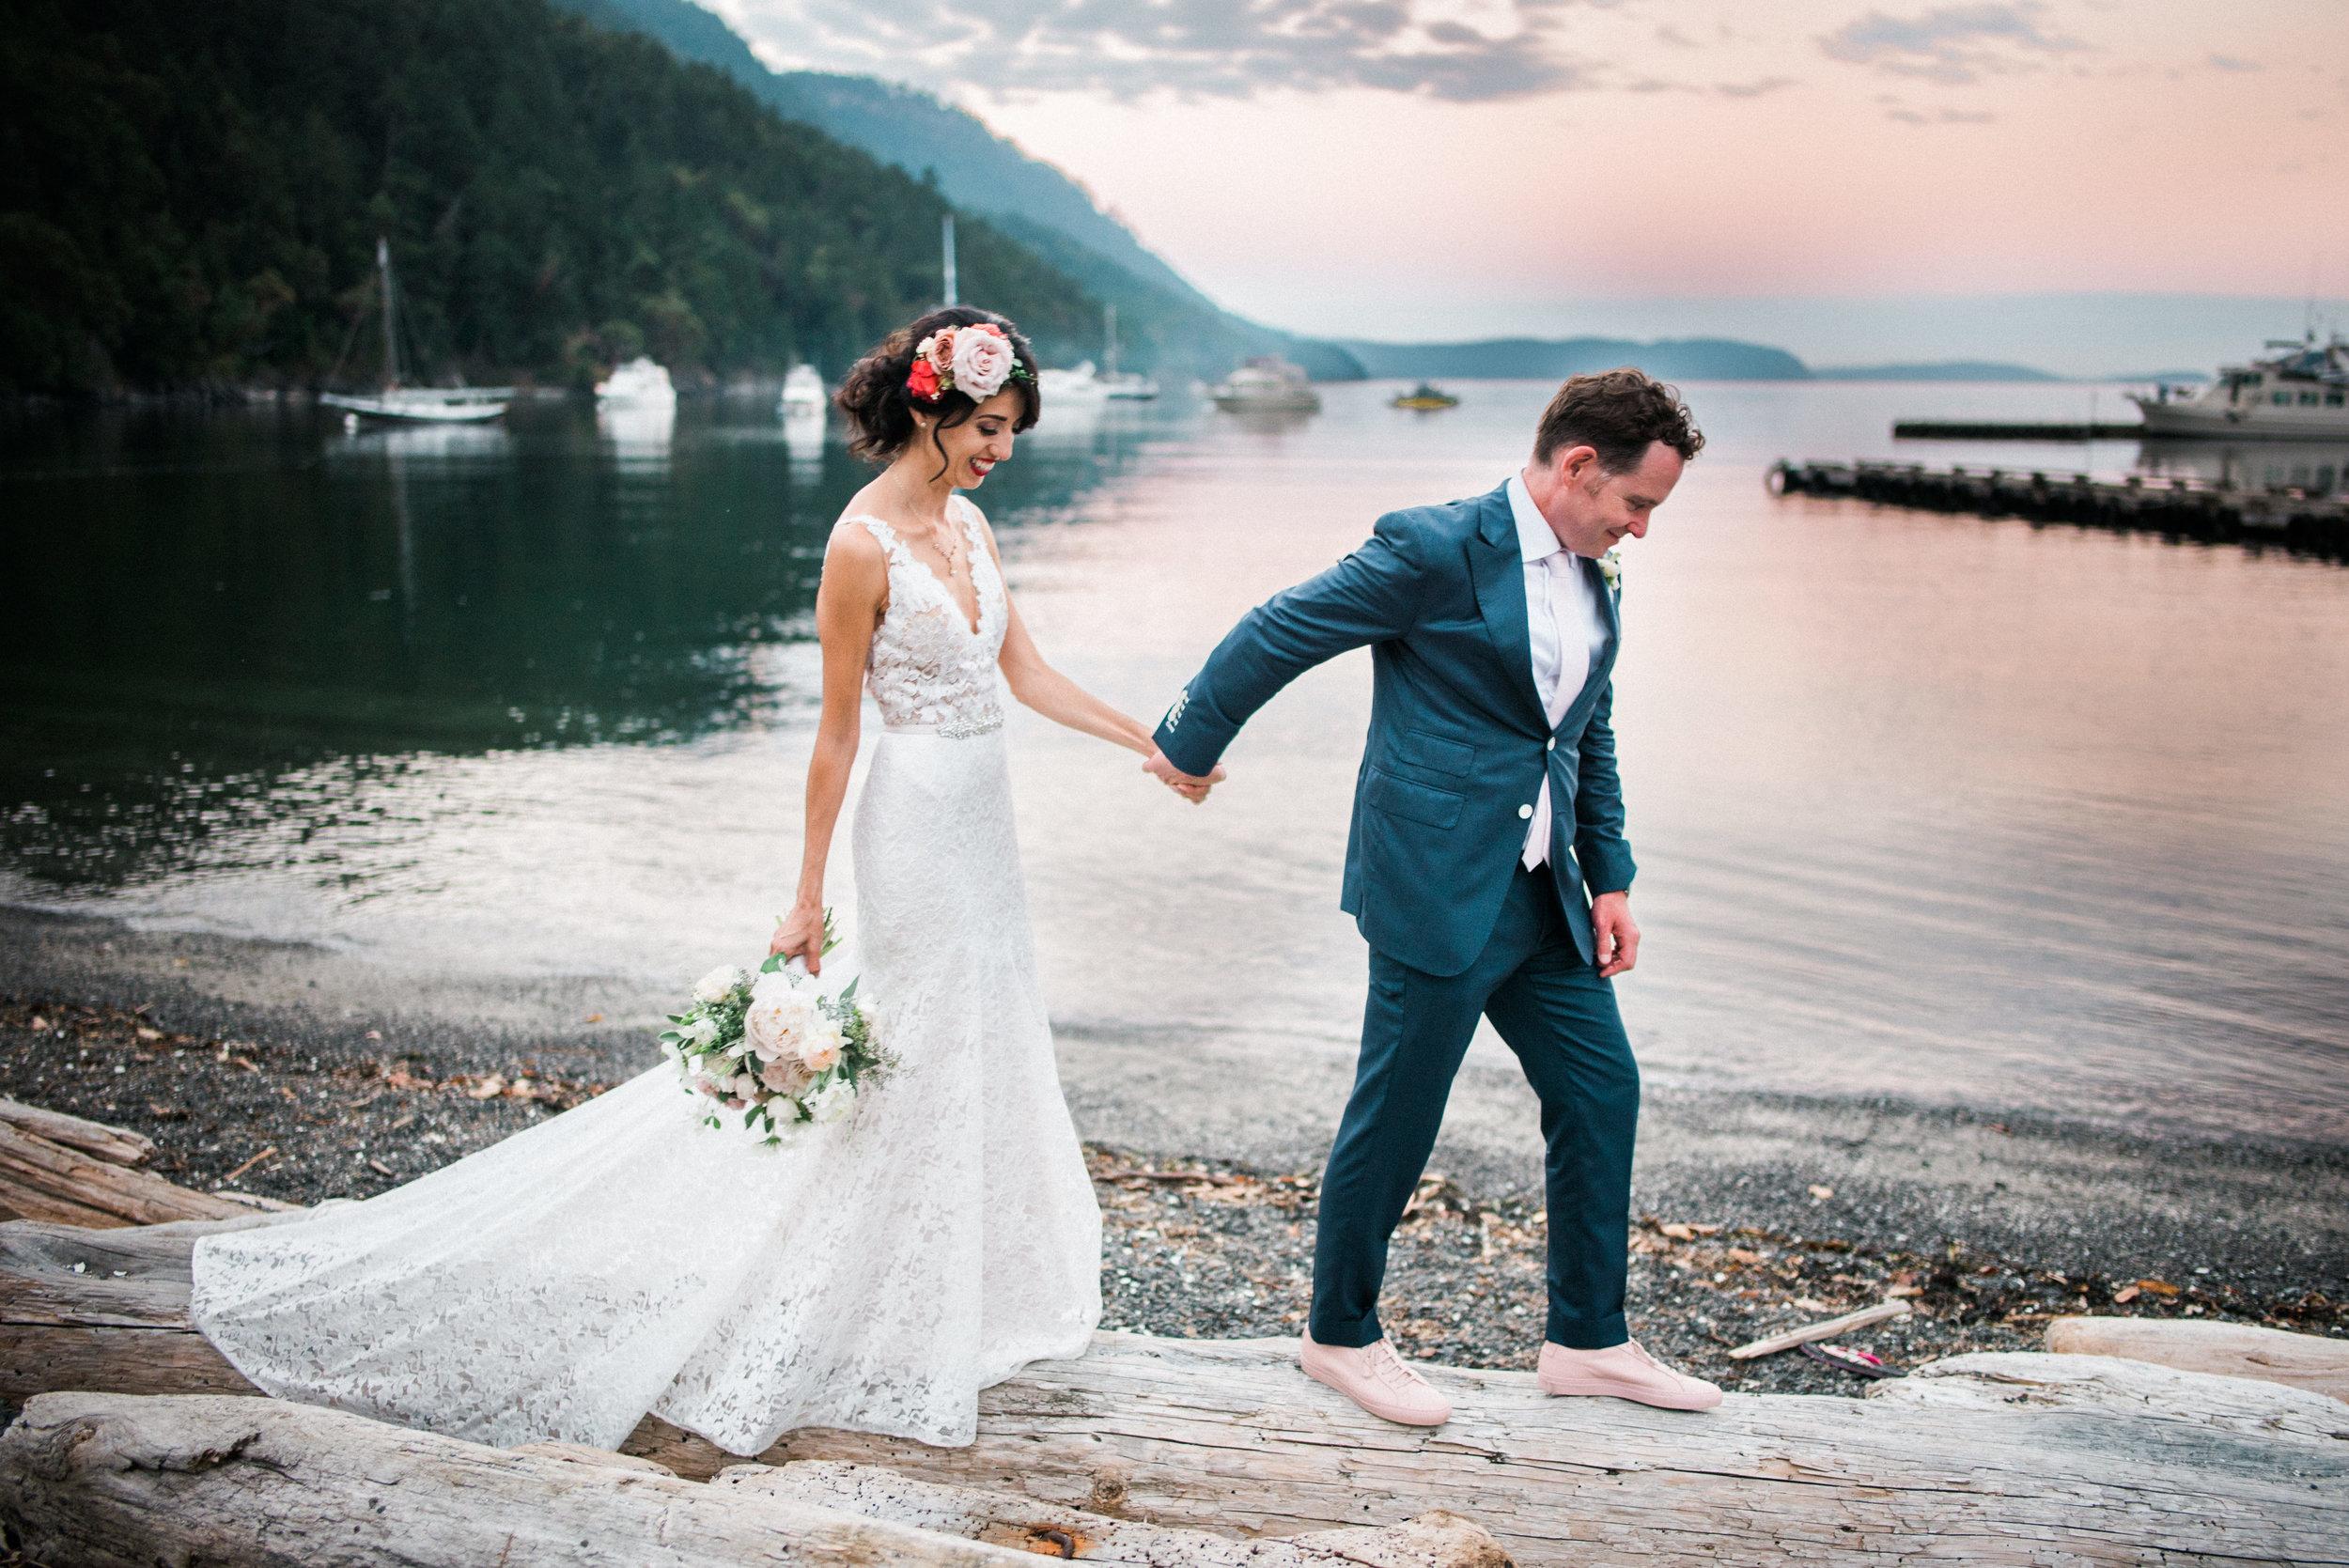 rosario-resort-orcas-island-wedding-ryan-flynn-photography-md-portraits-0124.JPG